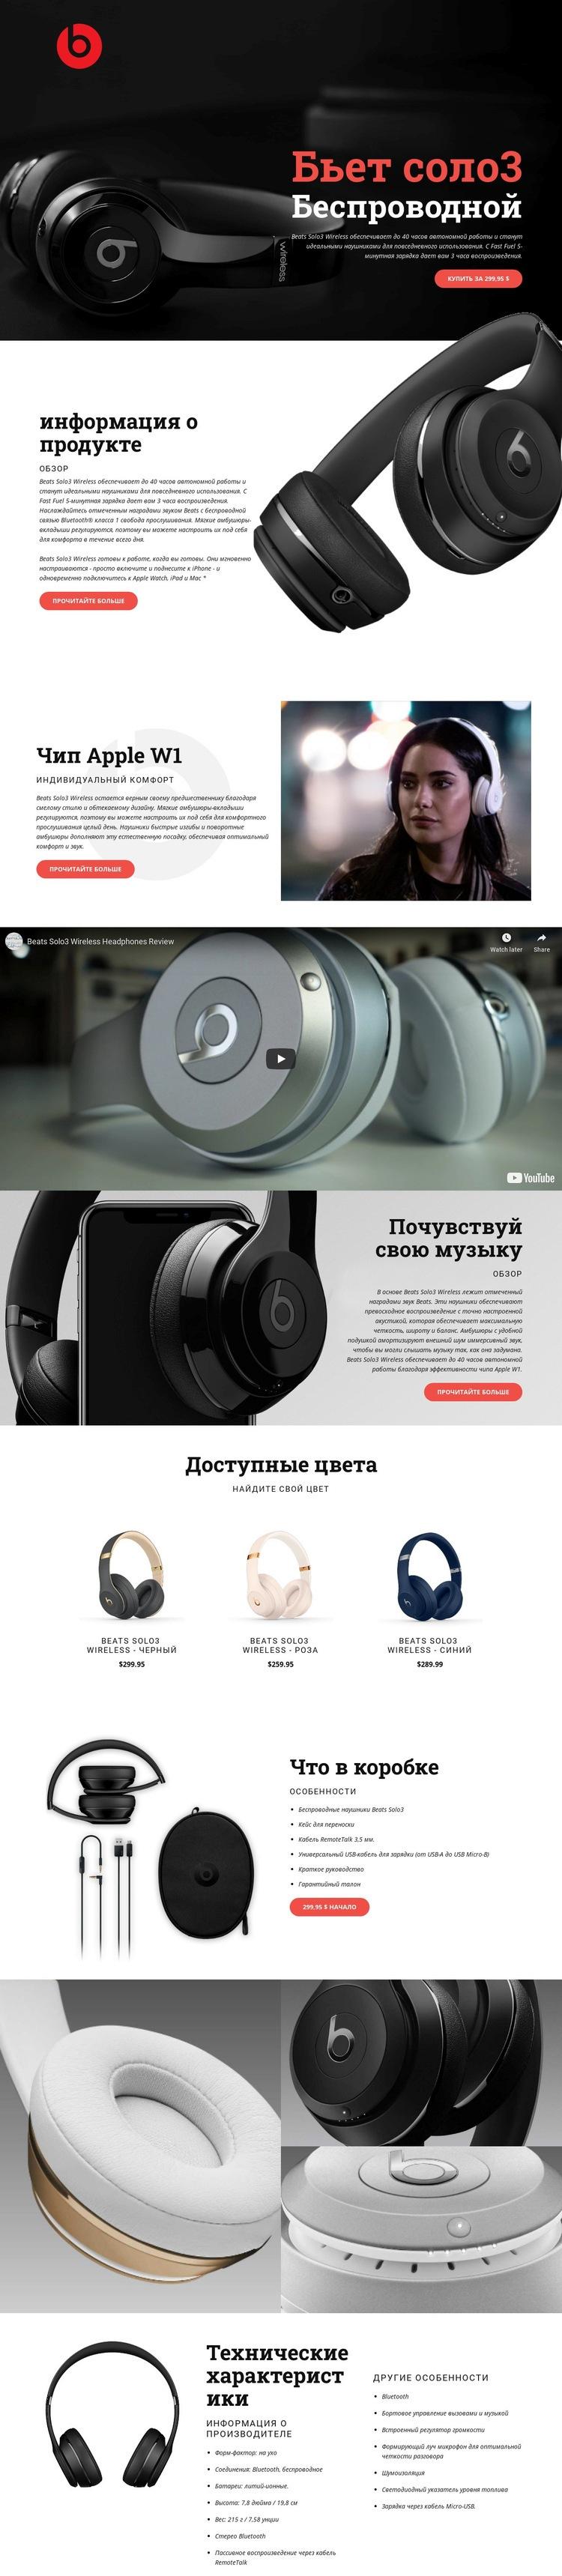 Превосходное качество музыки Шаблон веб-сайта